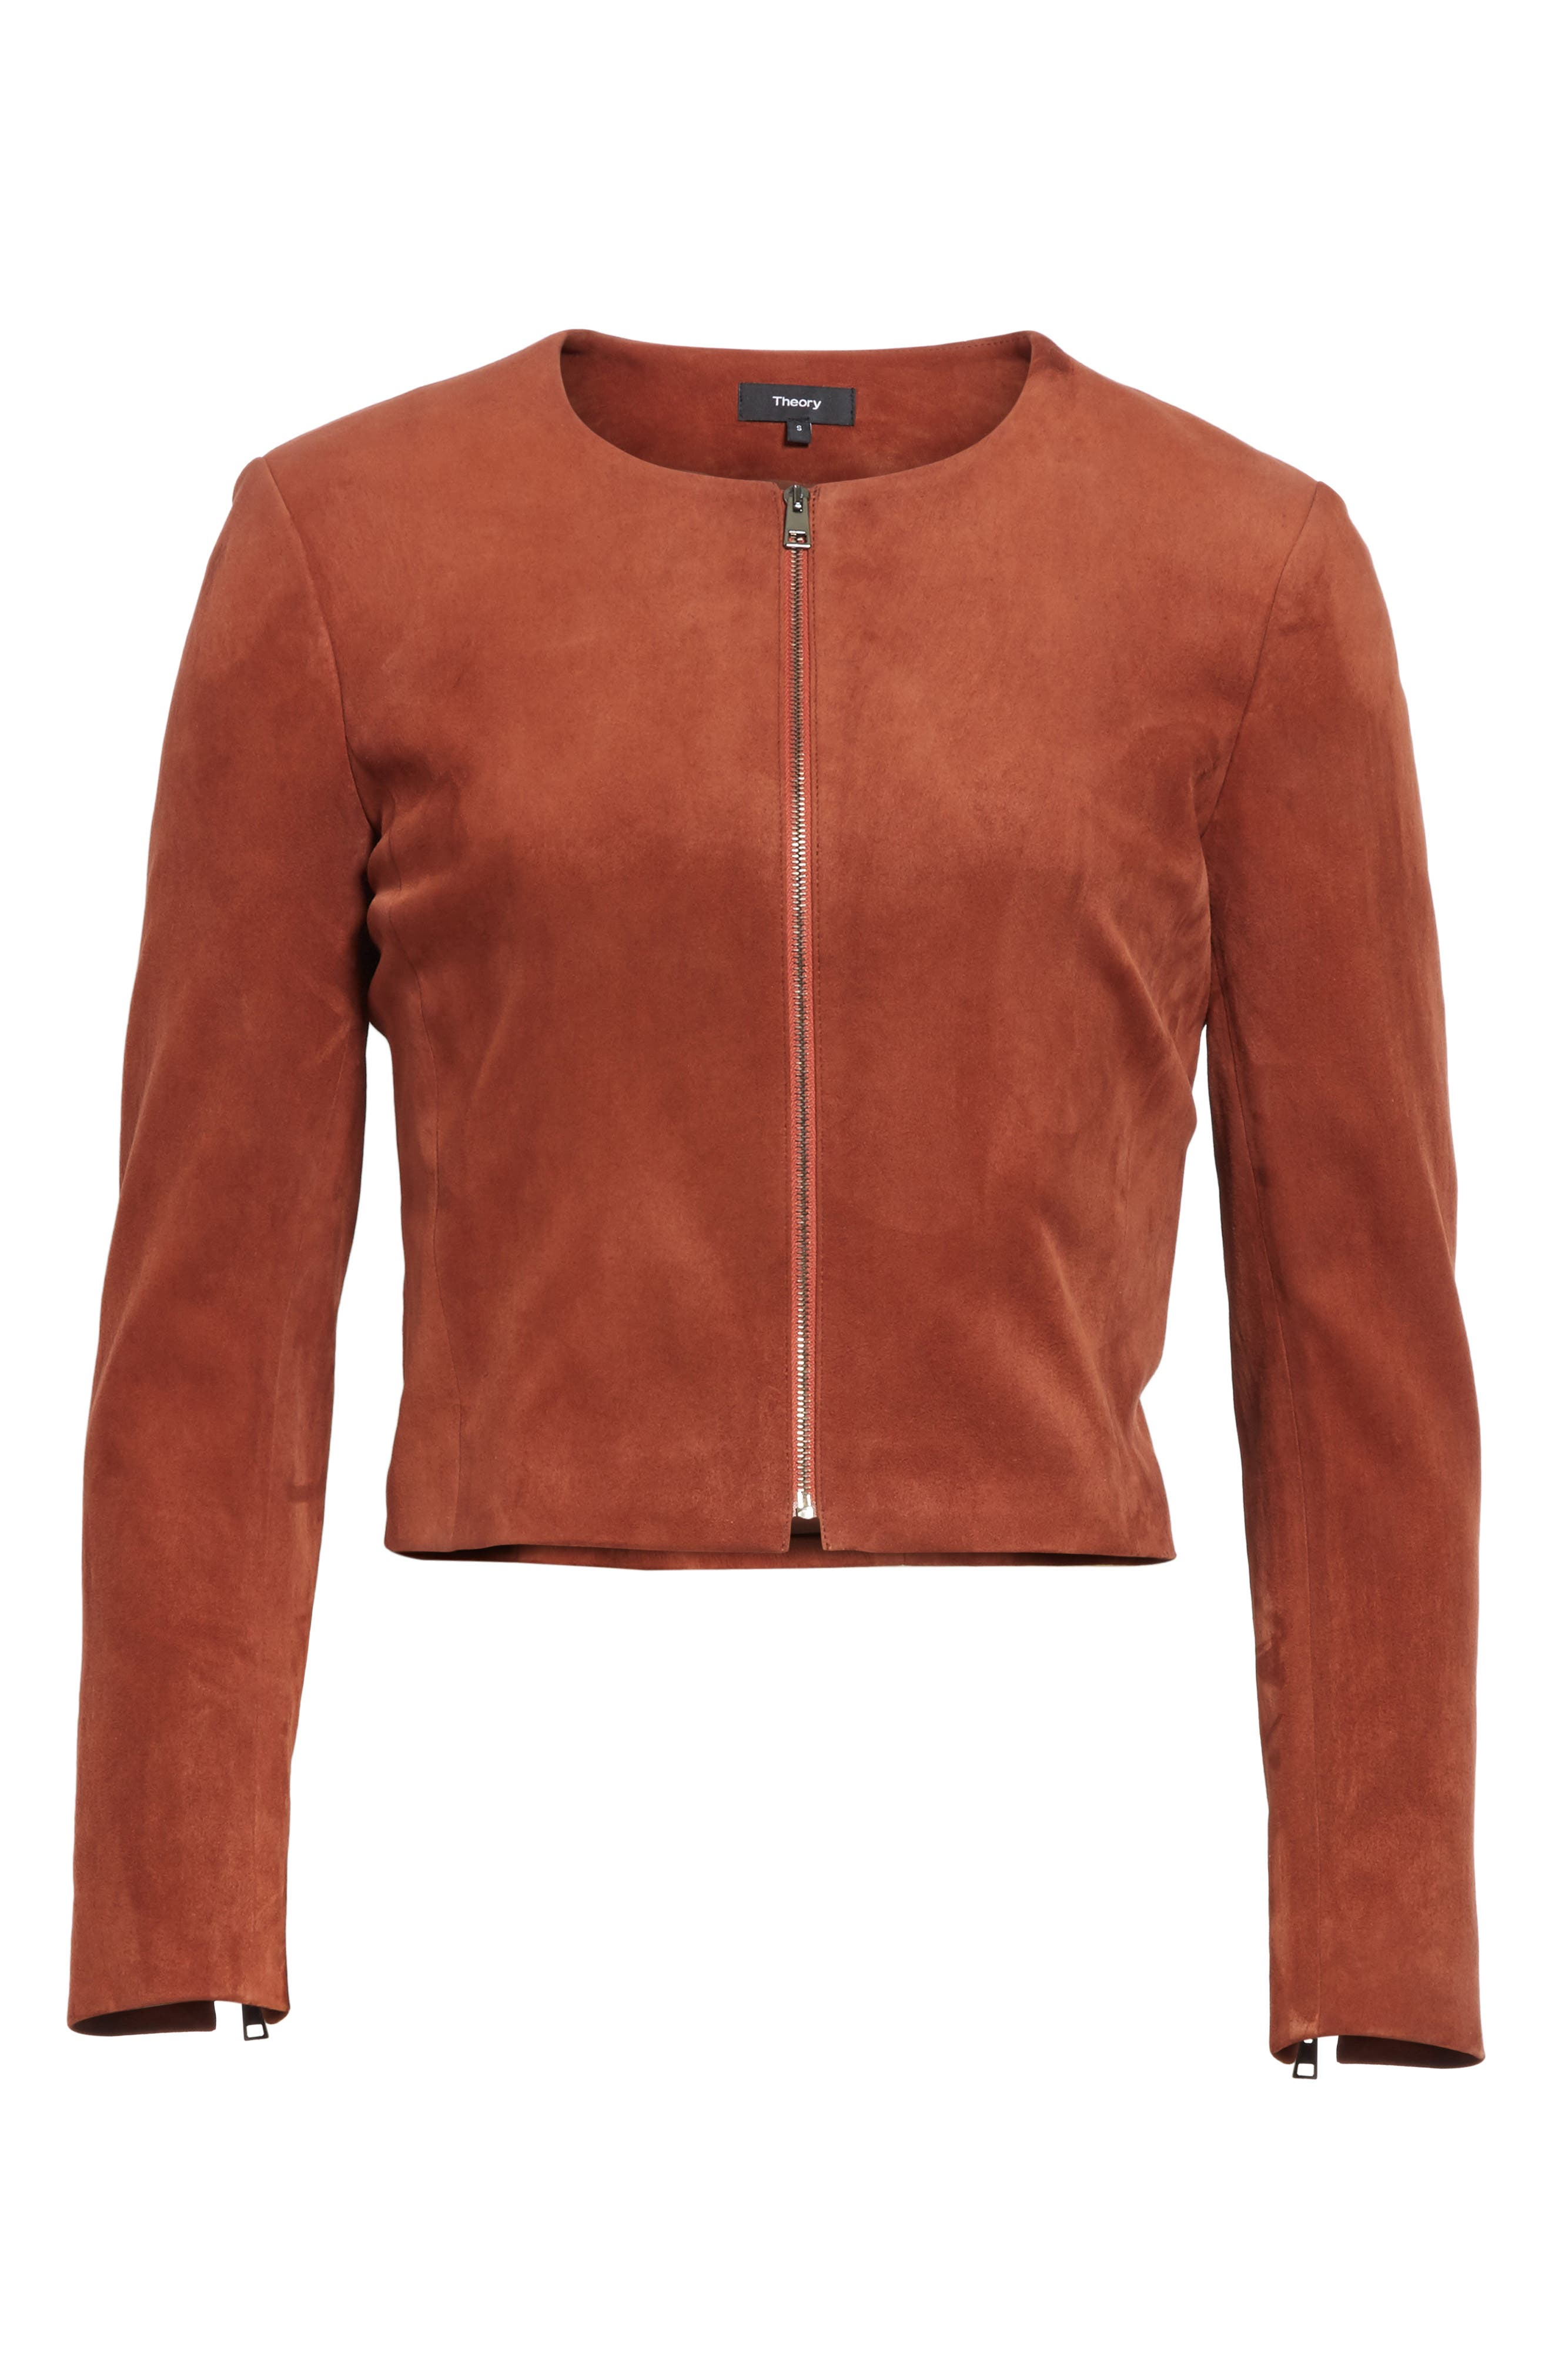 Morene Stretch Suede Jacket,                             Alternate thumbnail 6, color,                             Brown Russet